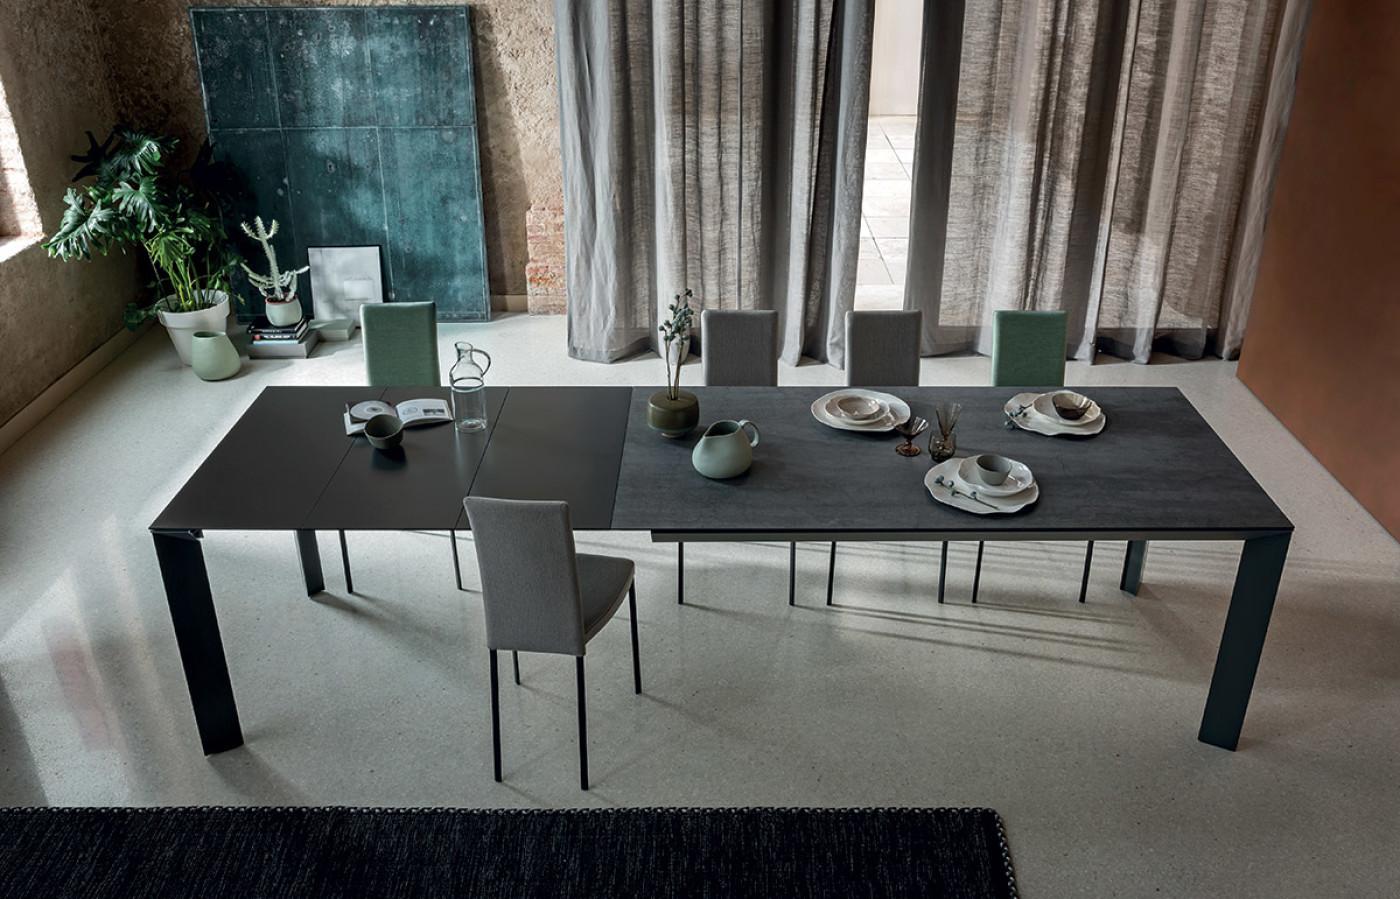 Tavoli e sedie bergamin arredamenti for Bergamin arredamenti istrana